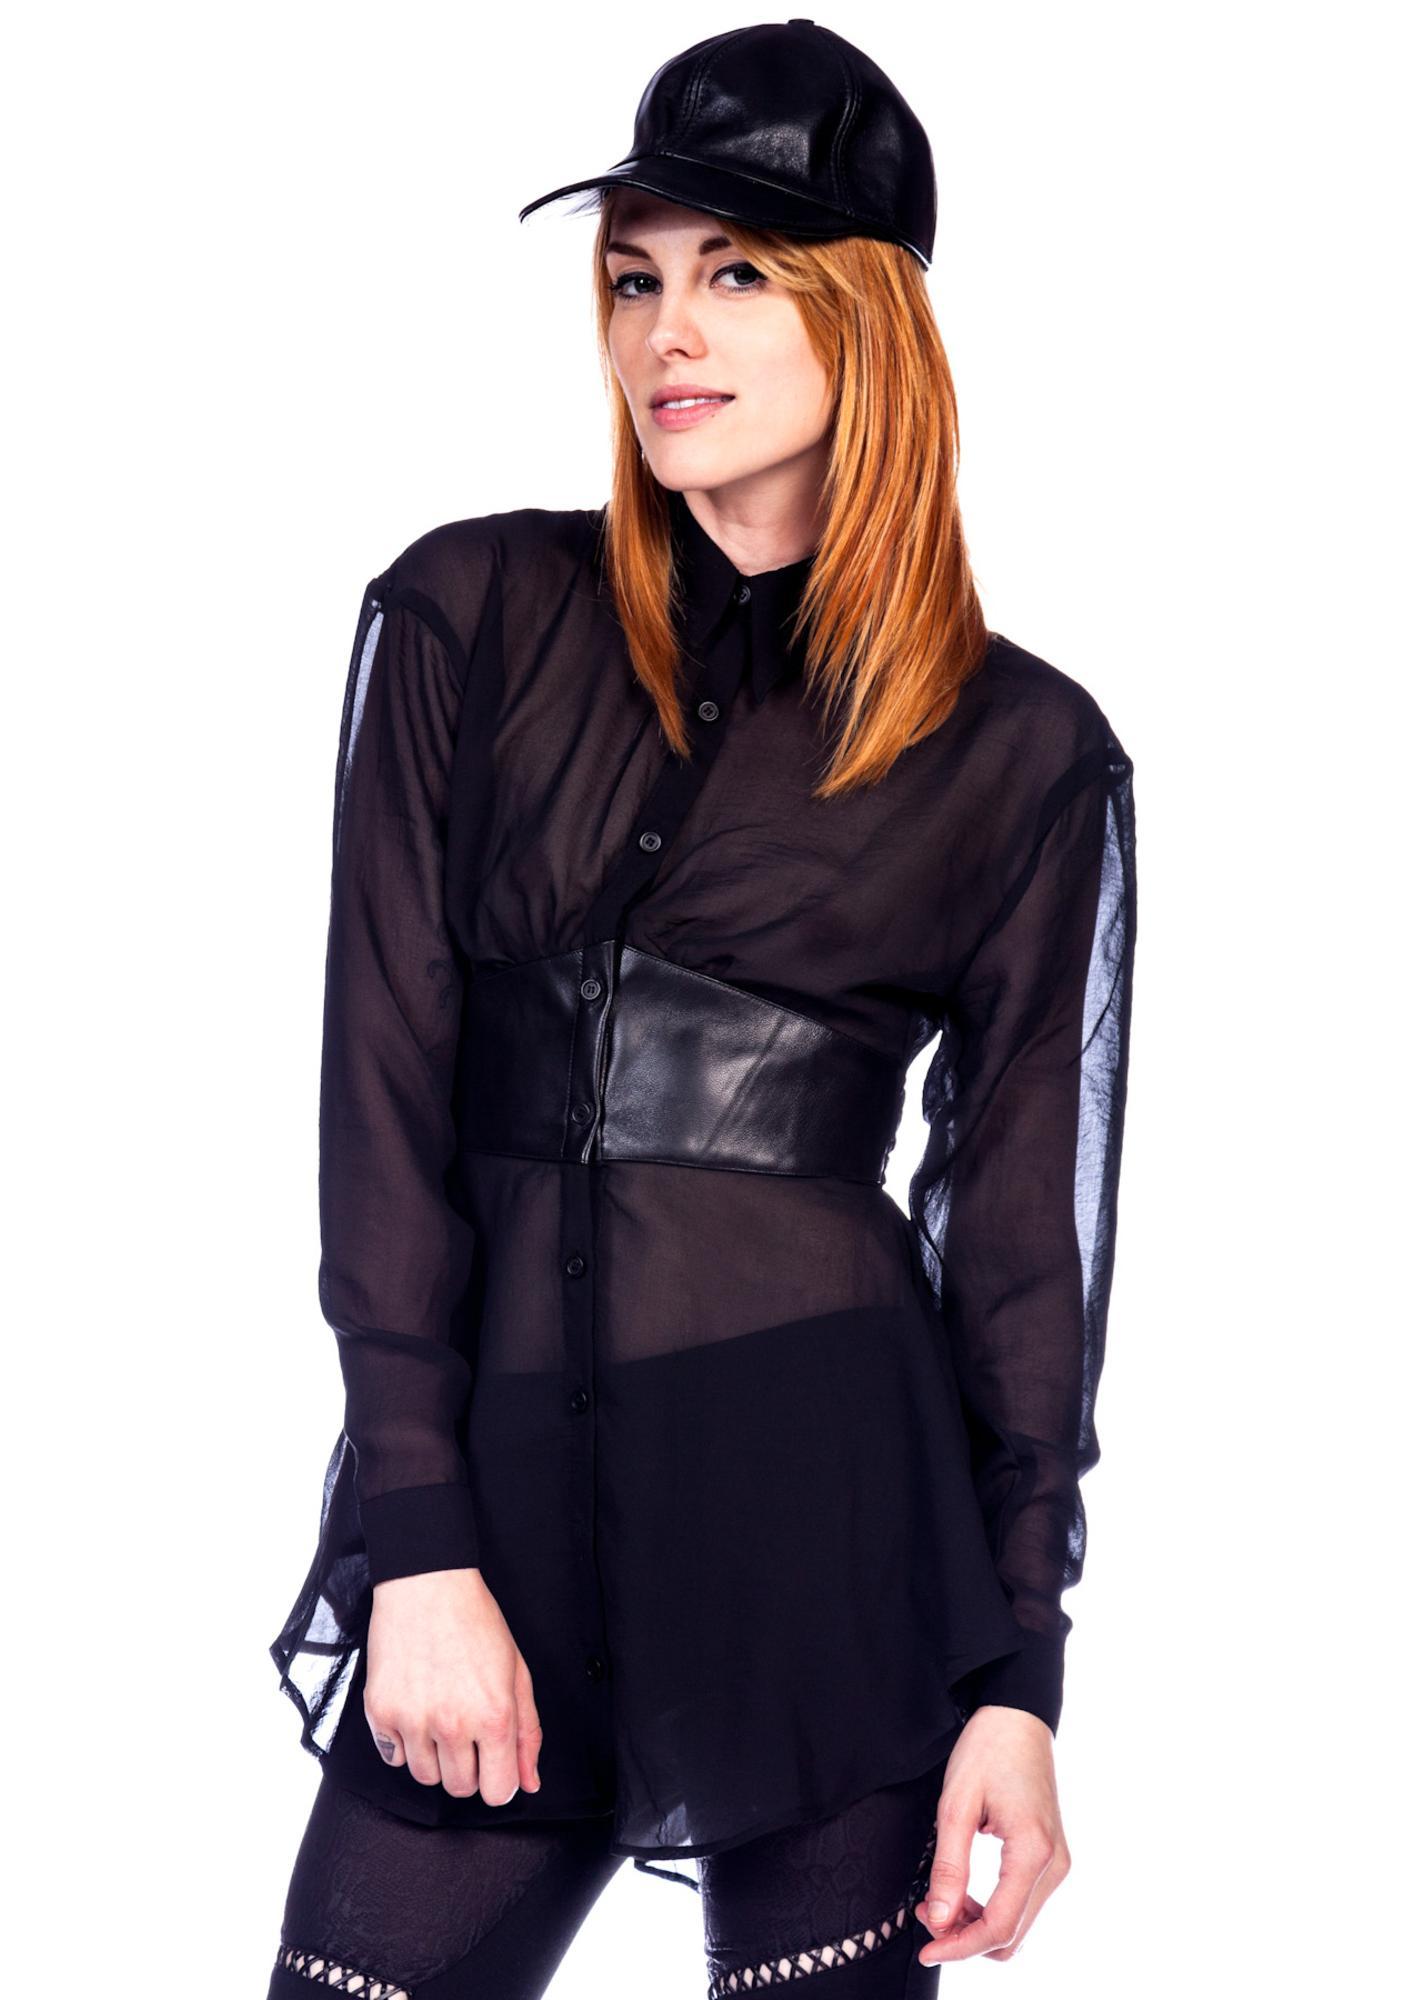 Widow Leather Waist Chiffon Top